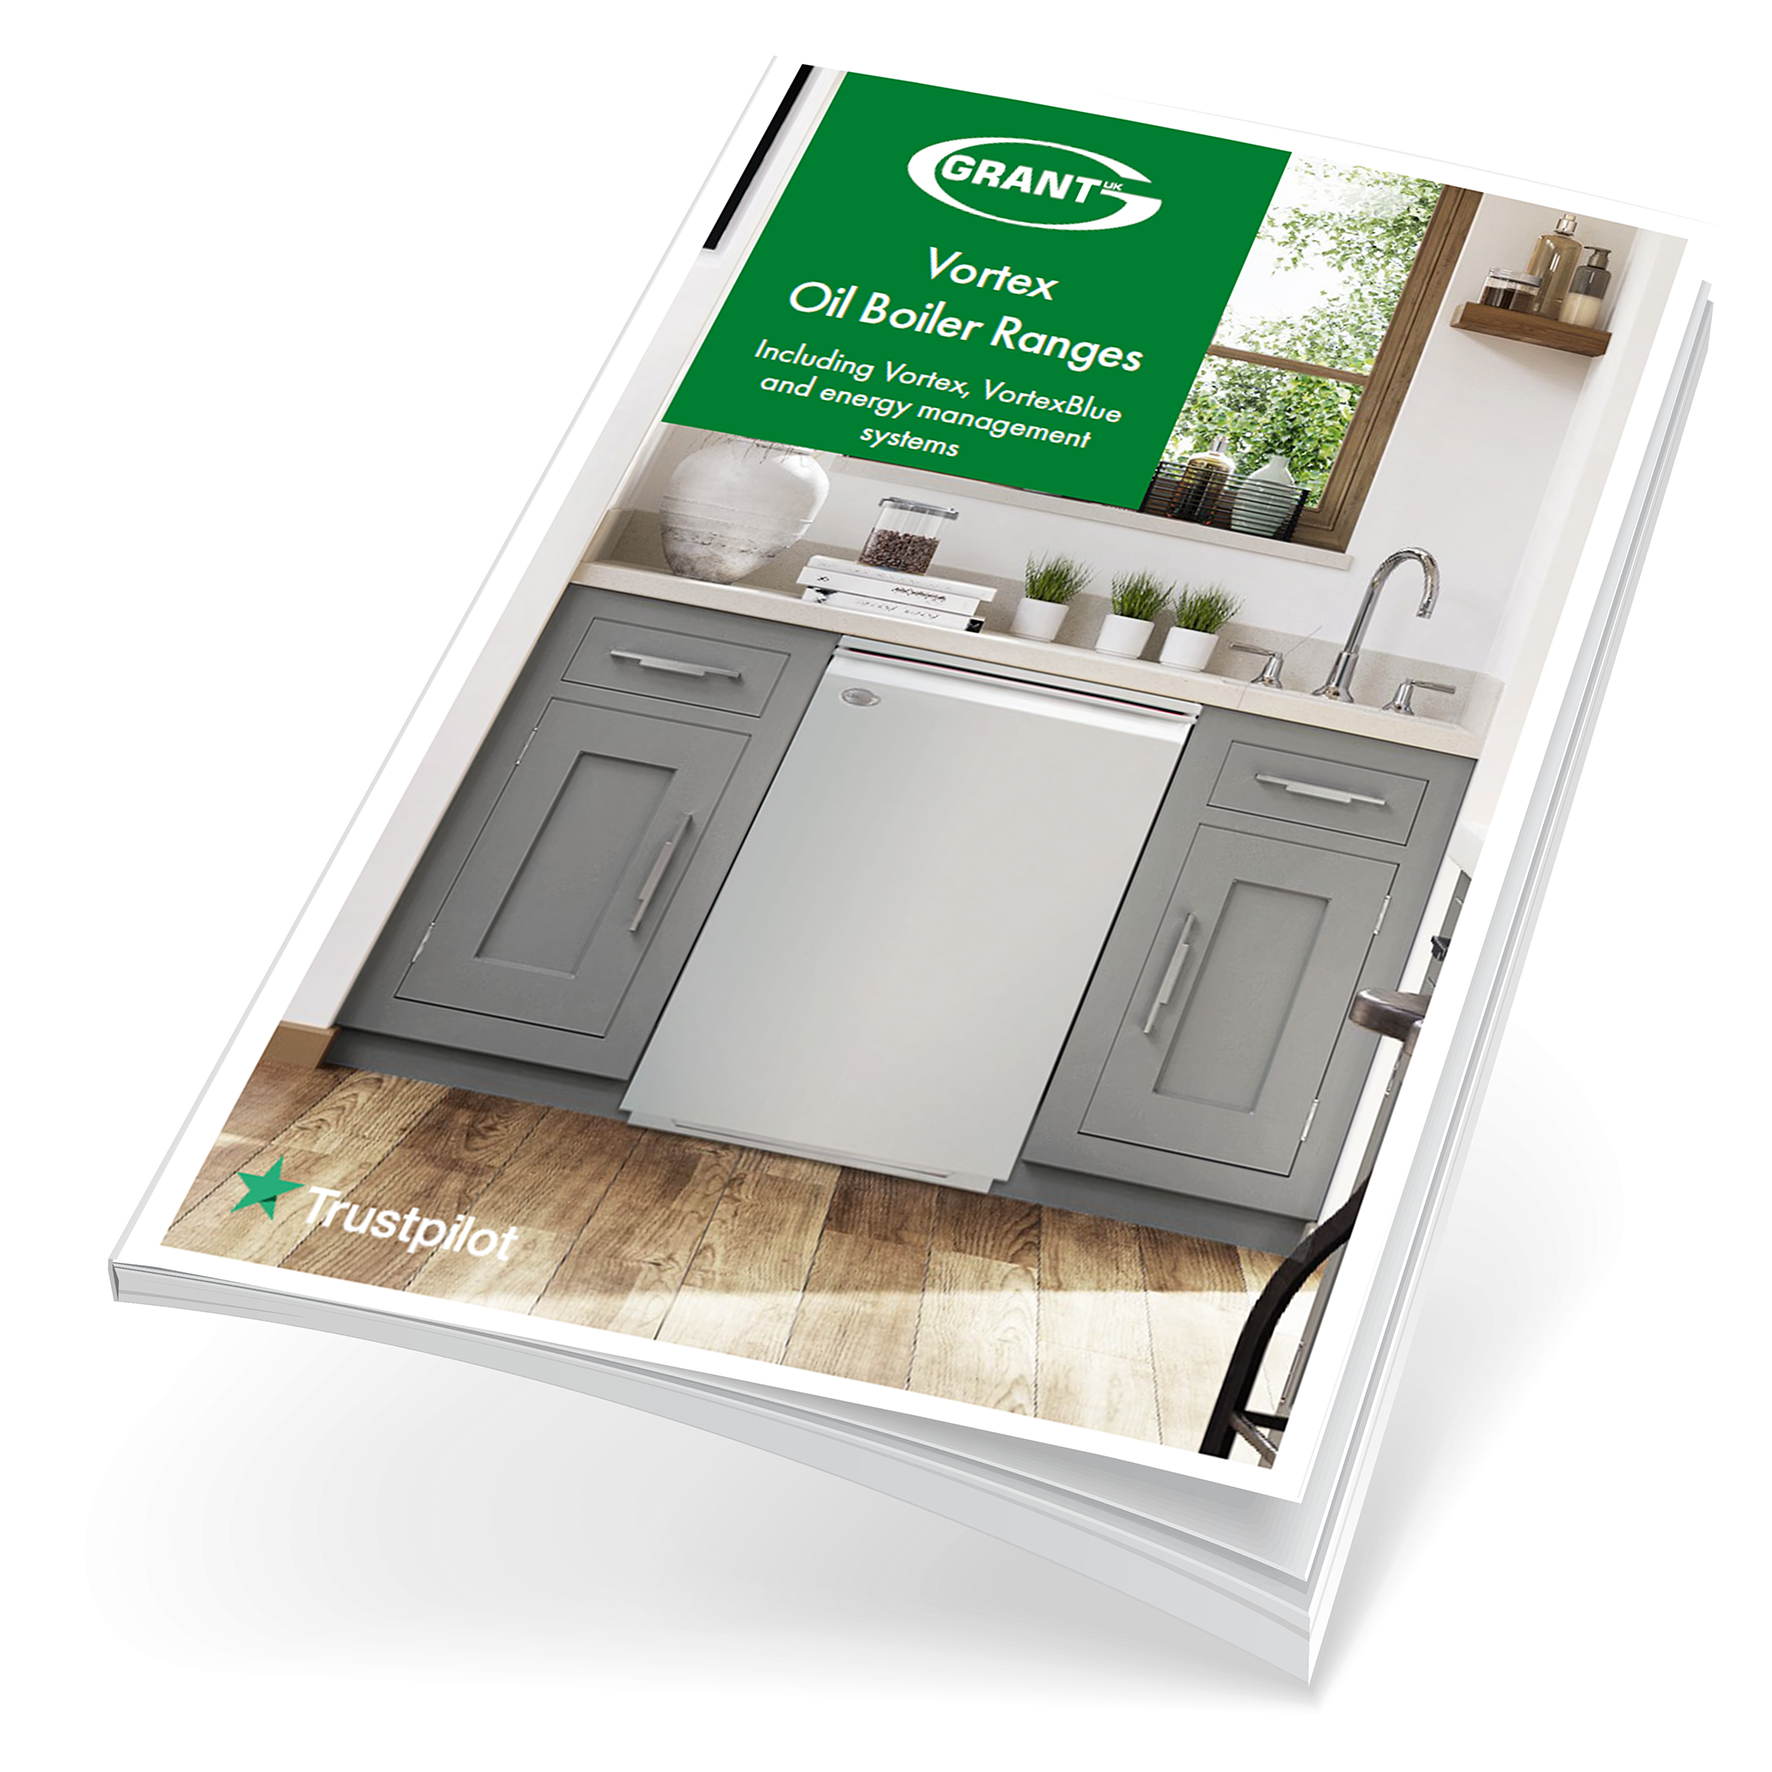 Grant UK unveils new 52 page oil boiler brochure